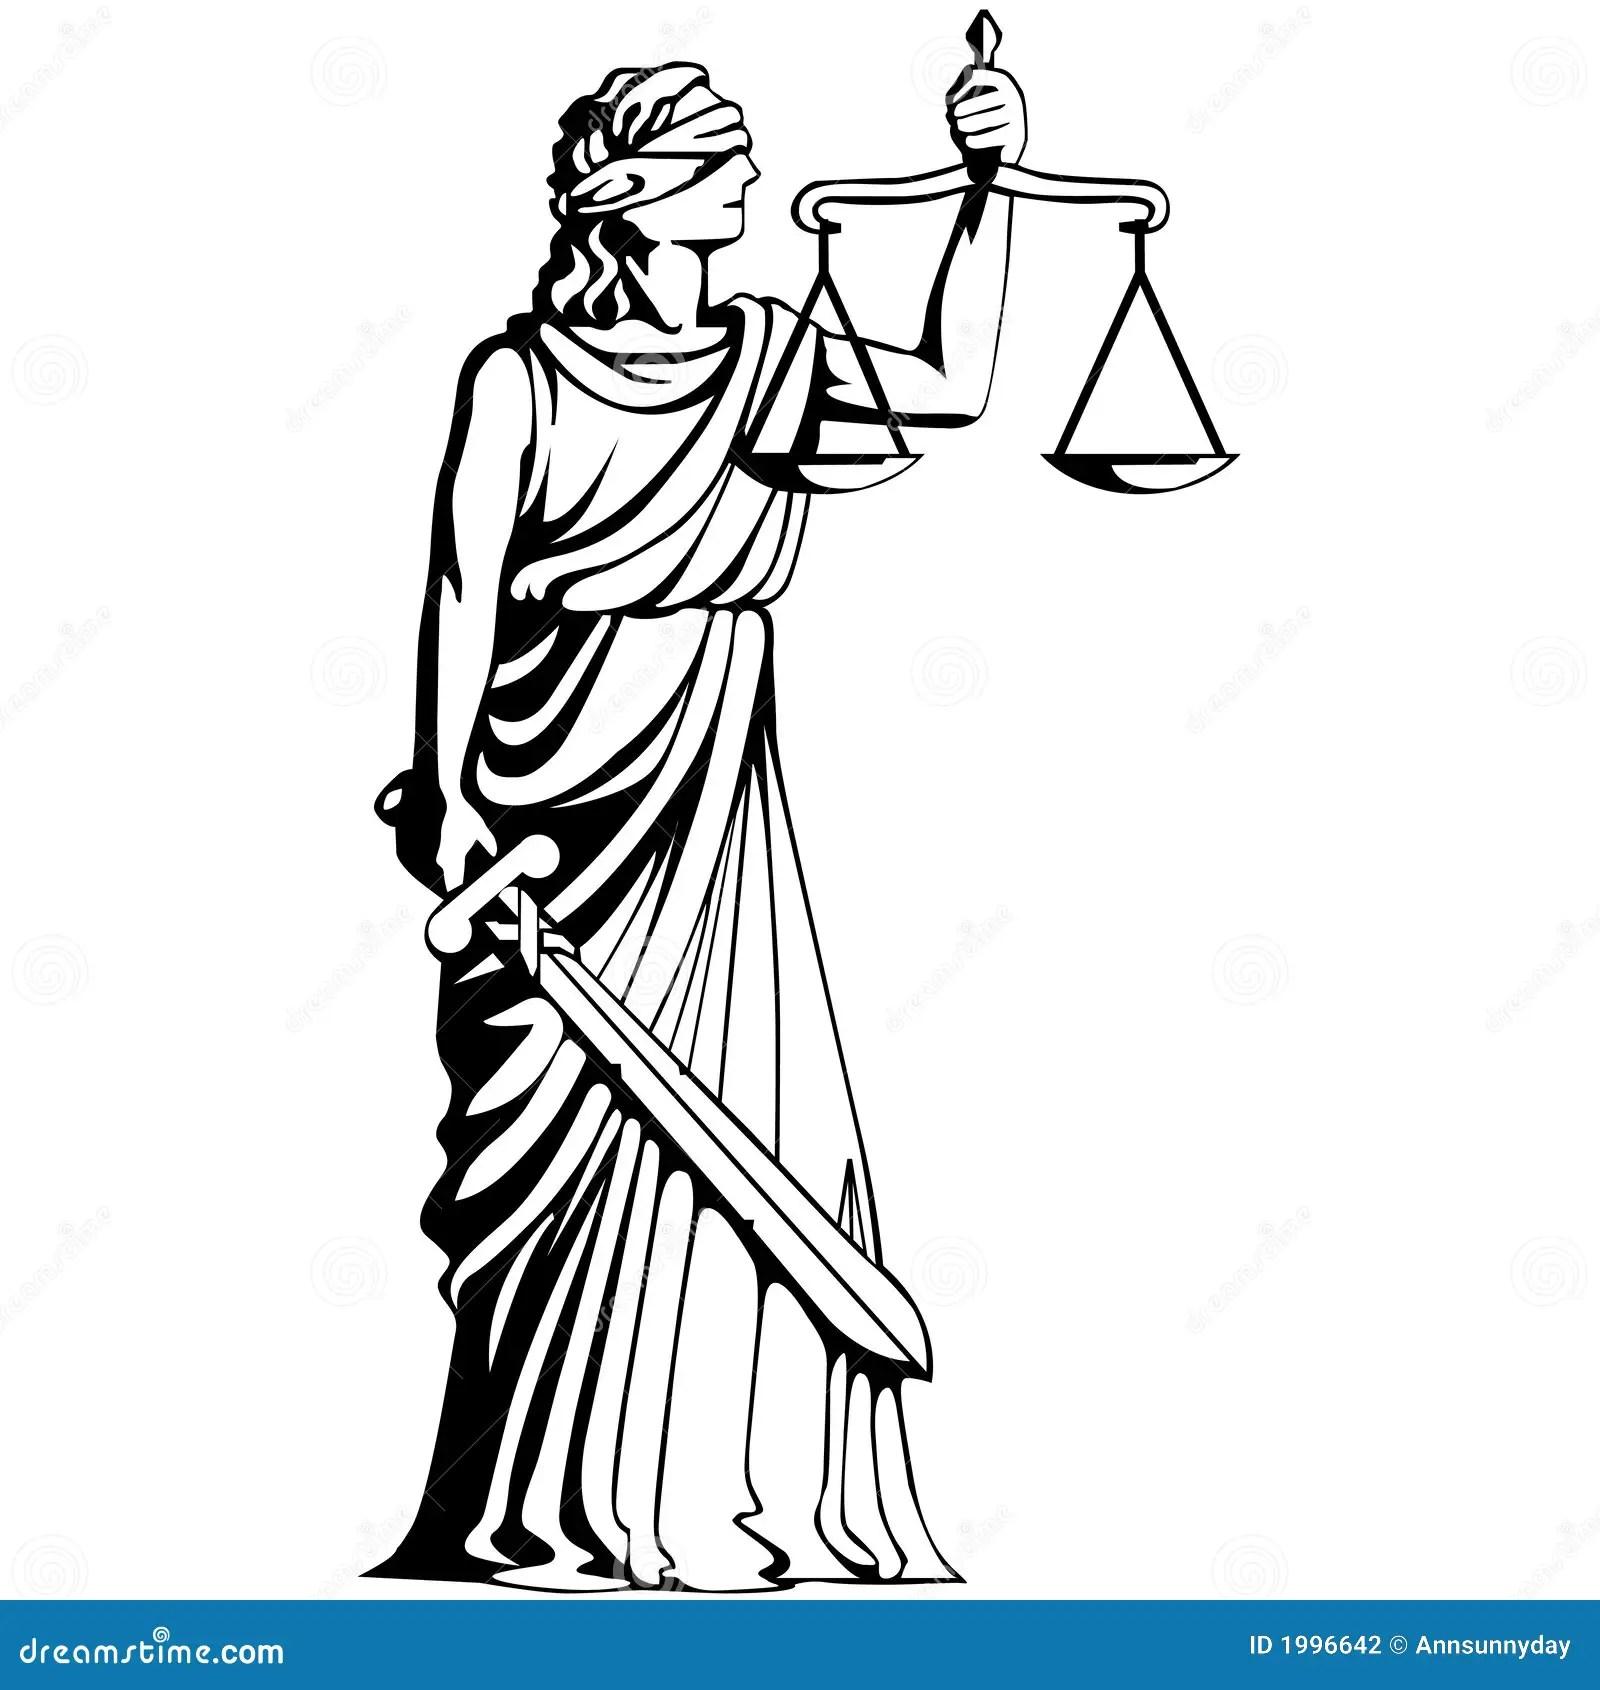 Symbol Of Judgement Stock Vector Illustration Of Wisdom